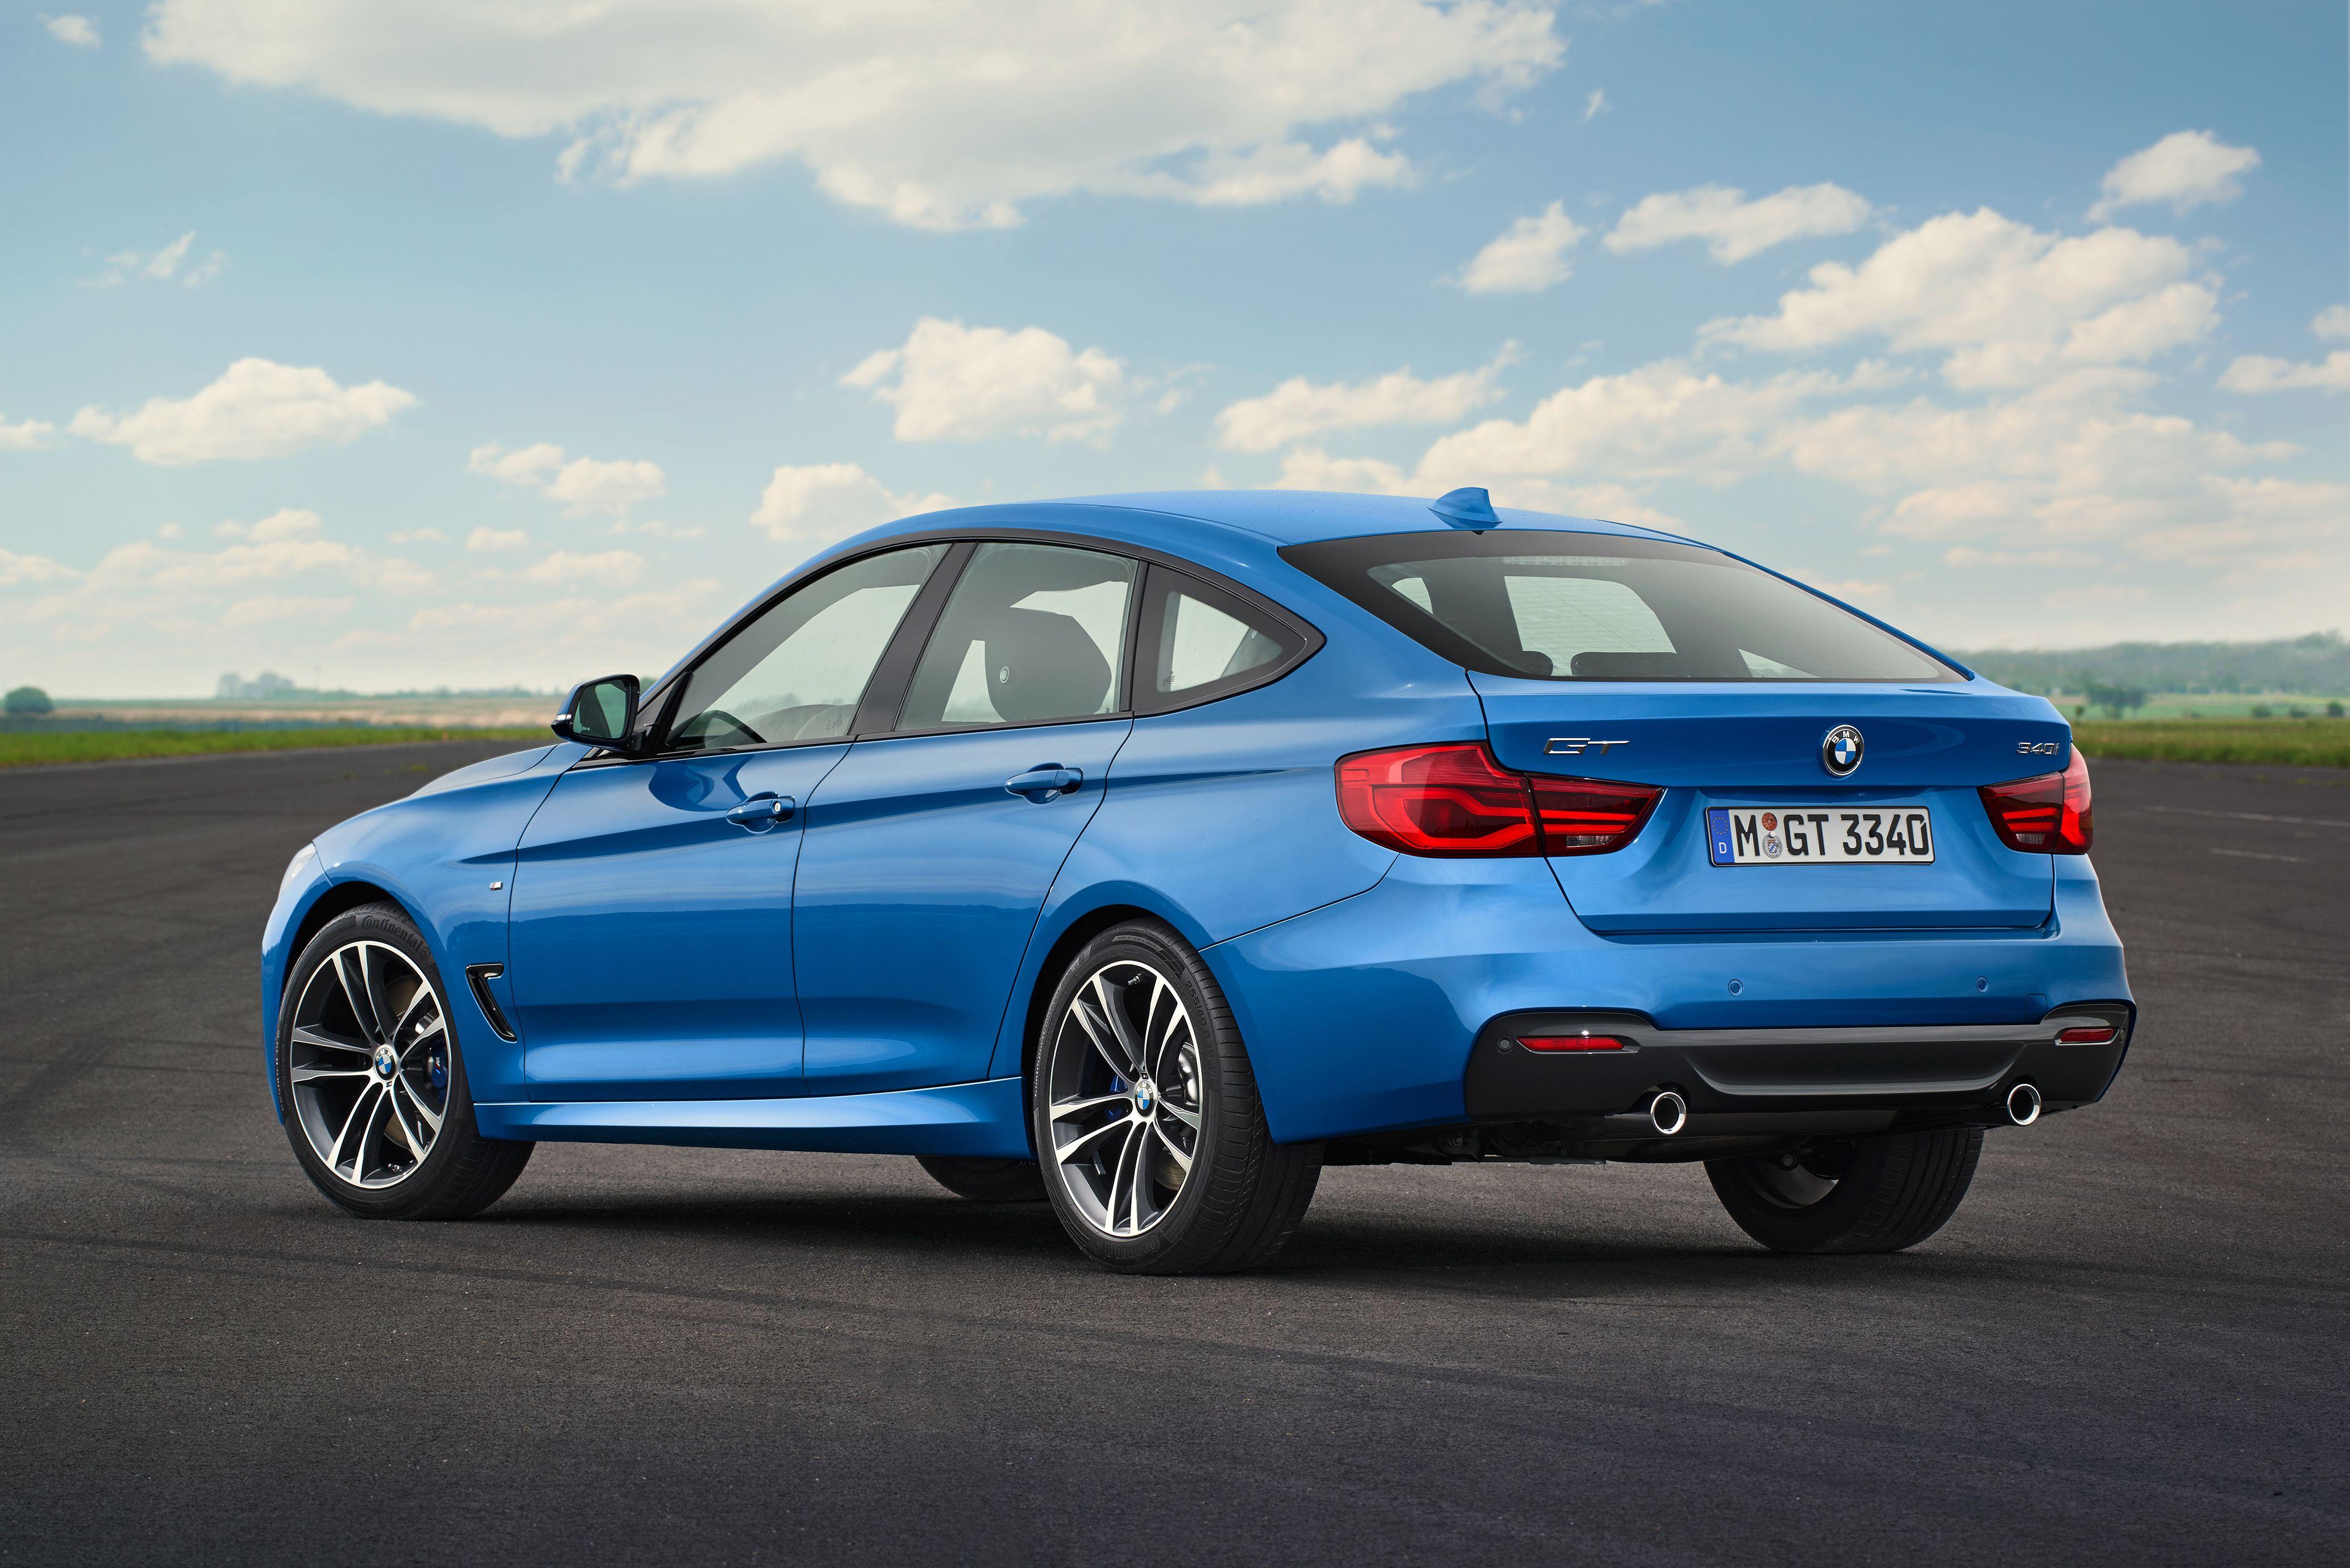 #BMW #F34 #340i #GranTurismo #MPackage #EstorilBlue #Facelift #FamilyCar #Badass #Burn #Luxury #Provocative #Sexy #Hot #Live #Life #Love #Follow #Your #Heart #BMWLife